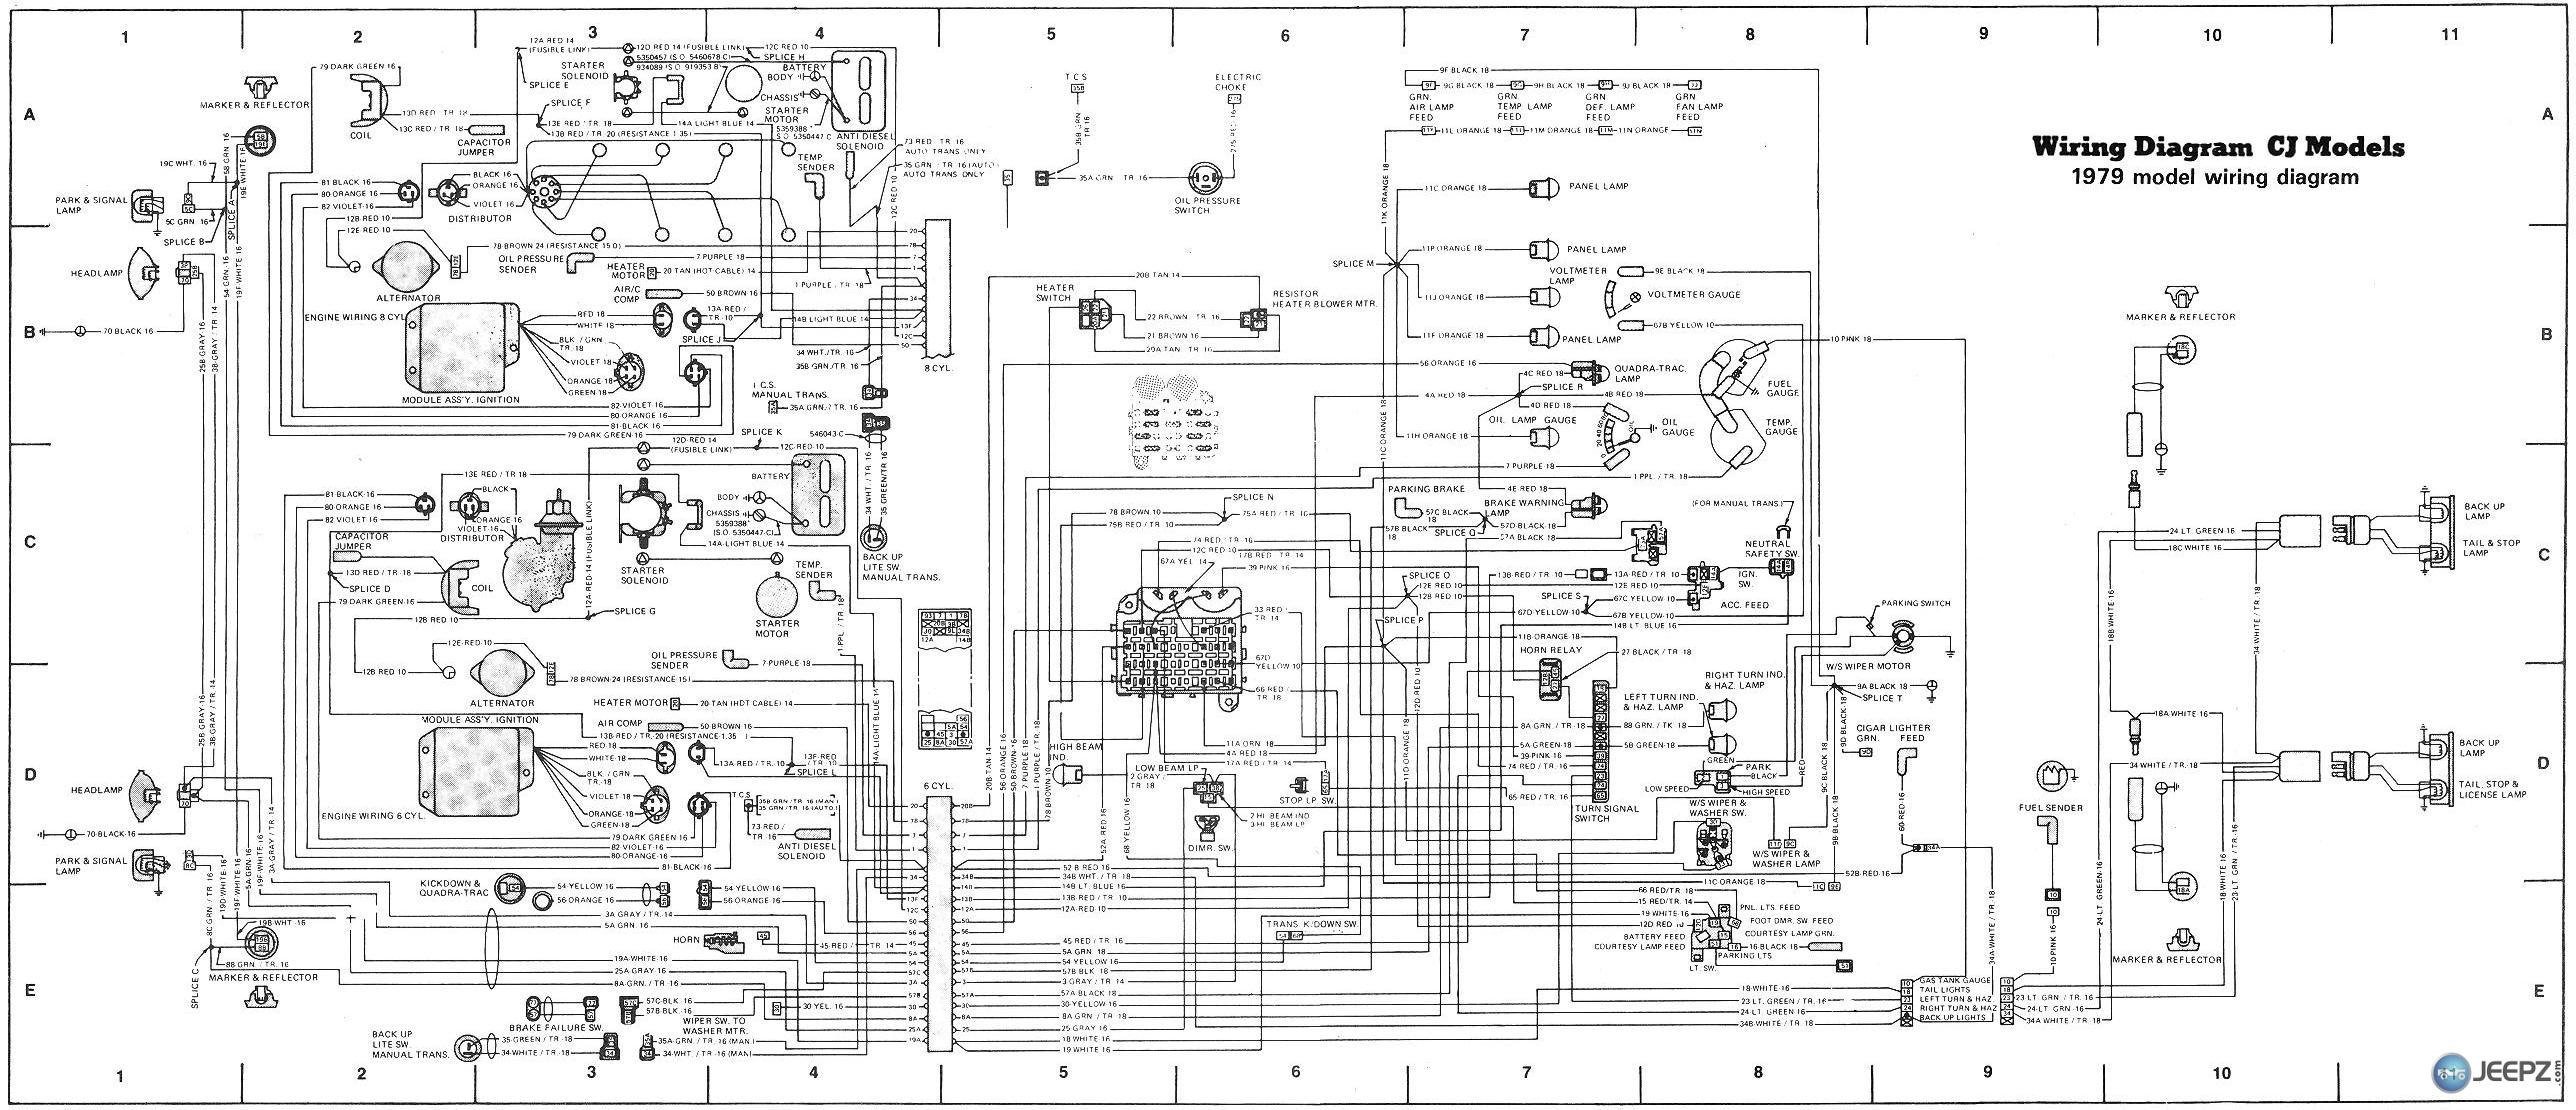 1985 Trans Am Wiring Diagram Electric Fan Schematic Diagrams Parisienne Electrical 1980 Radio